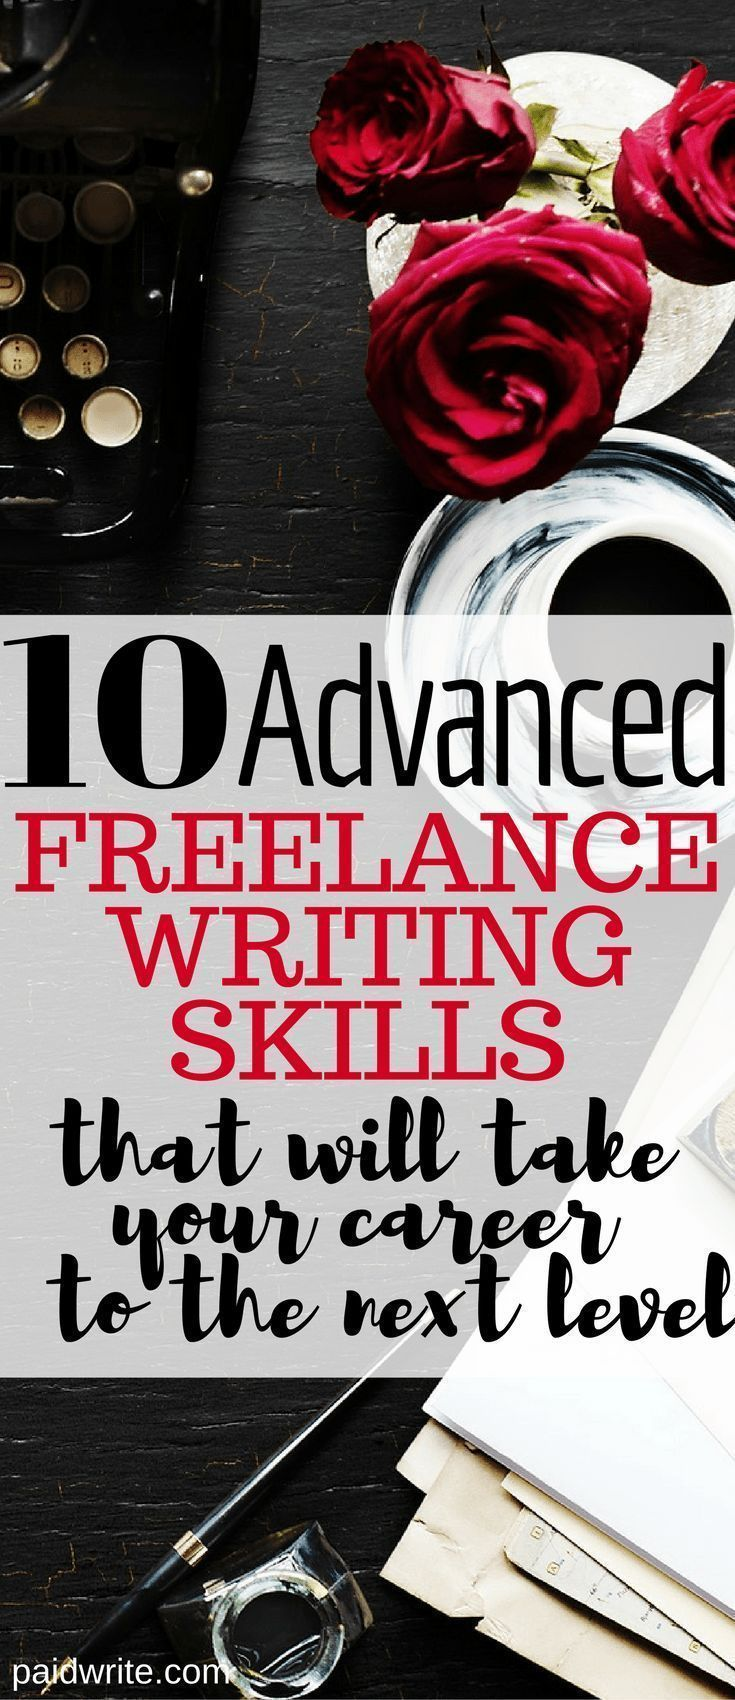 10 advanced freelance writing skills that will